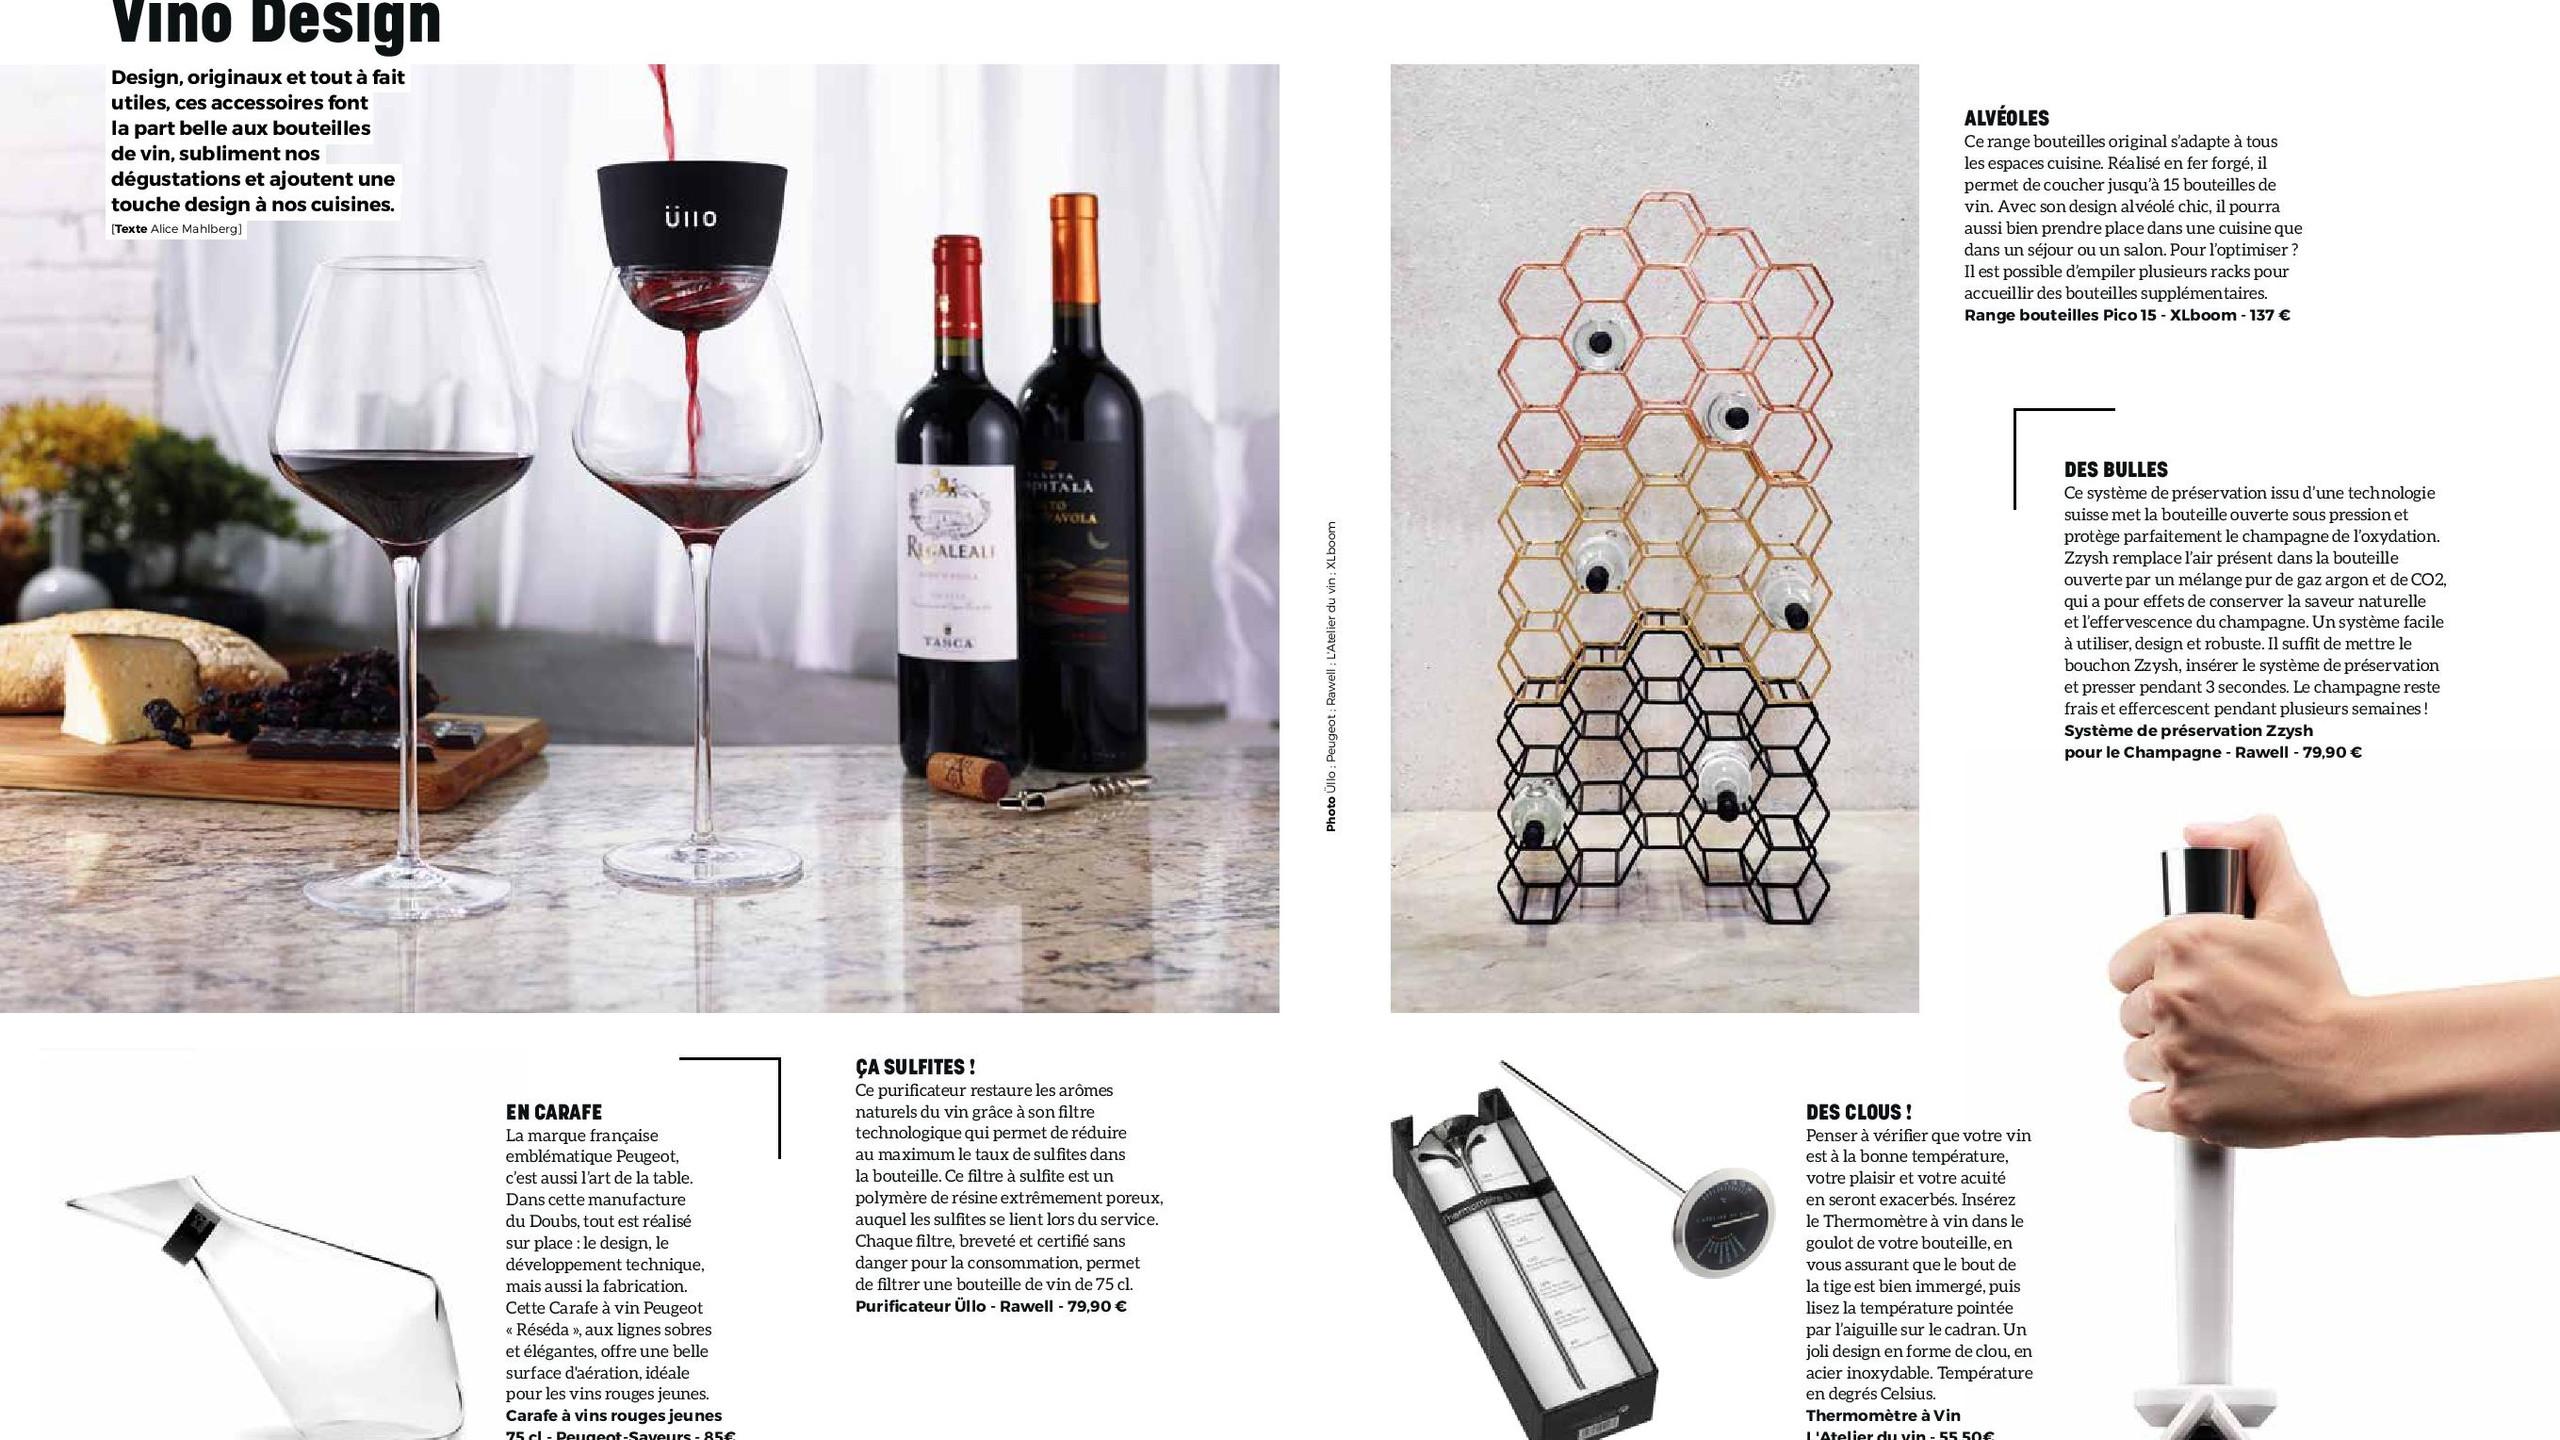 Vino Design